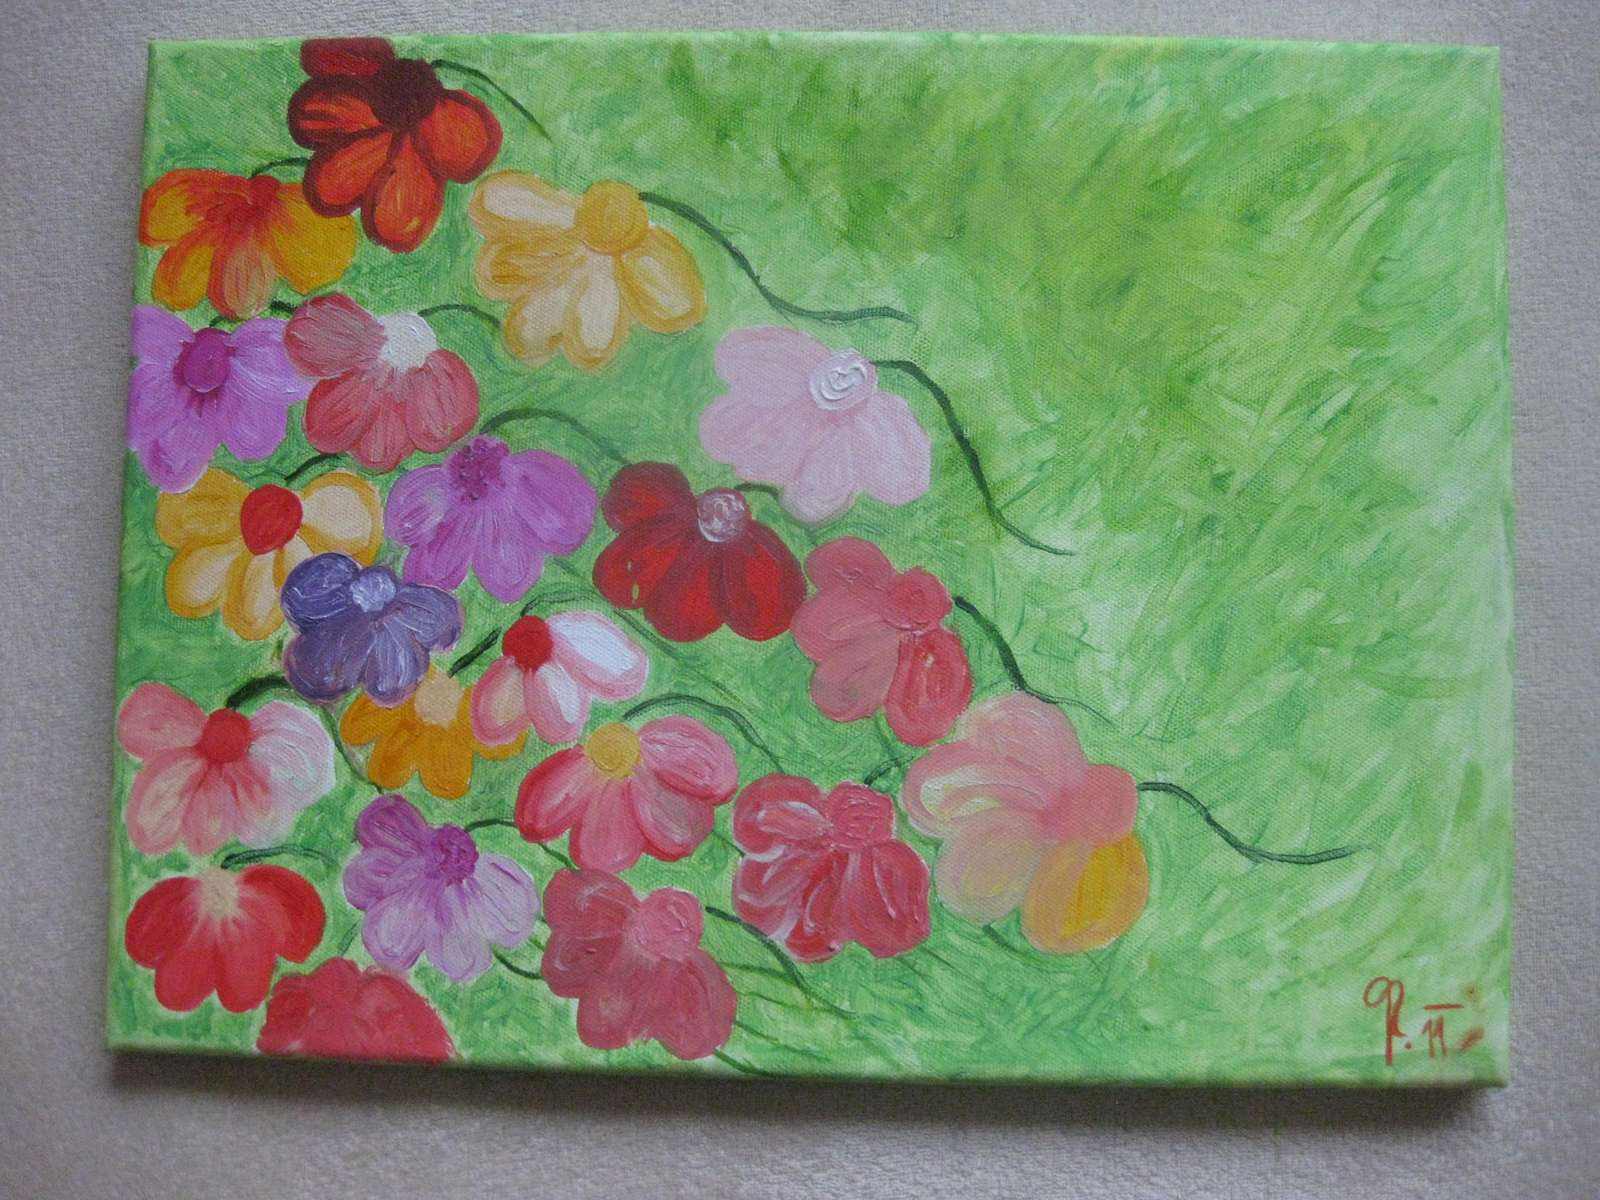 Malovany obraz - Obrázok č. 1